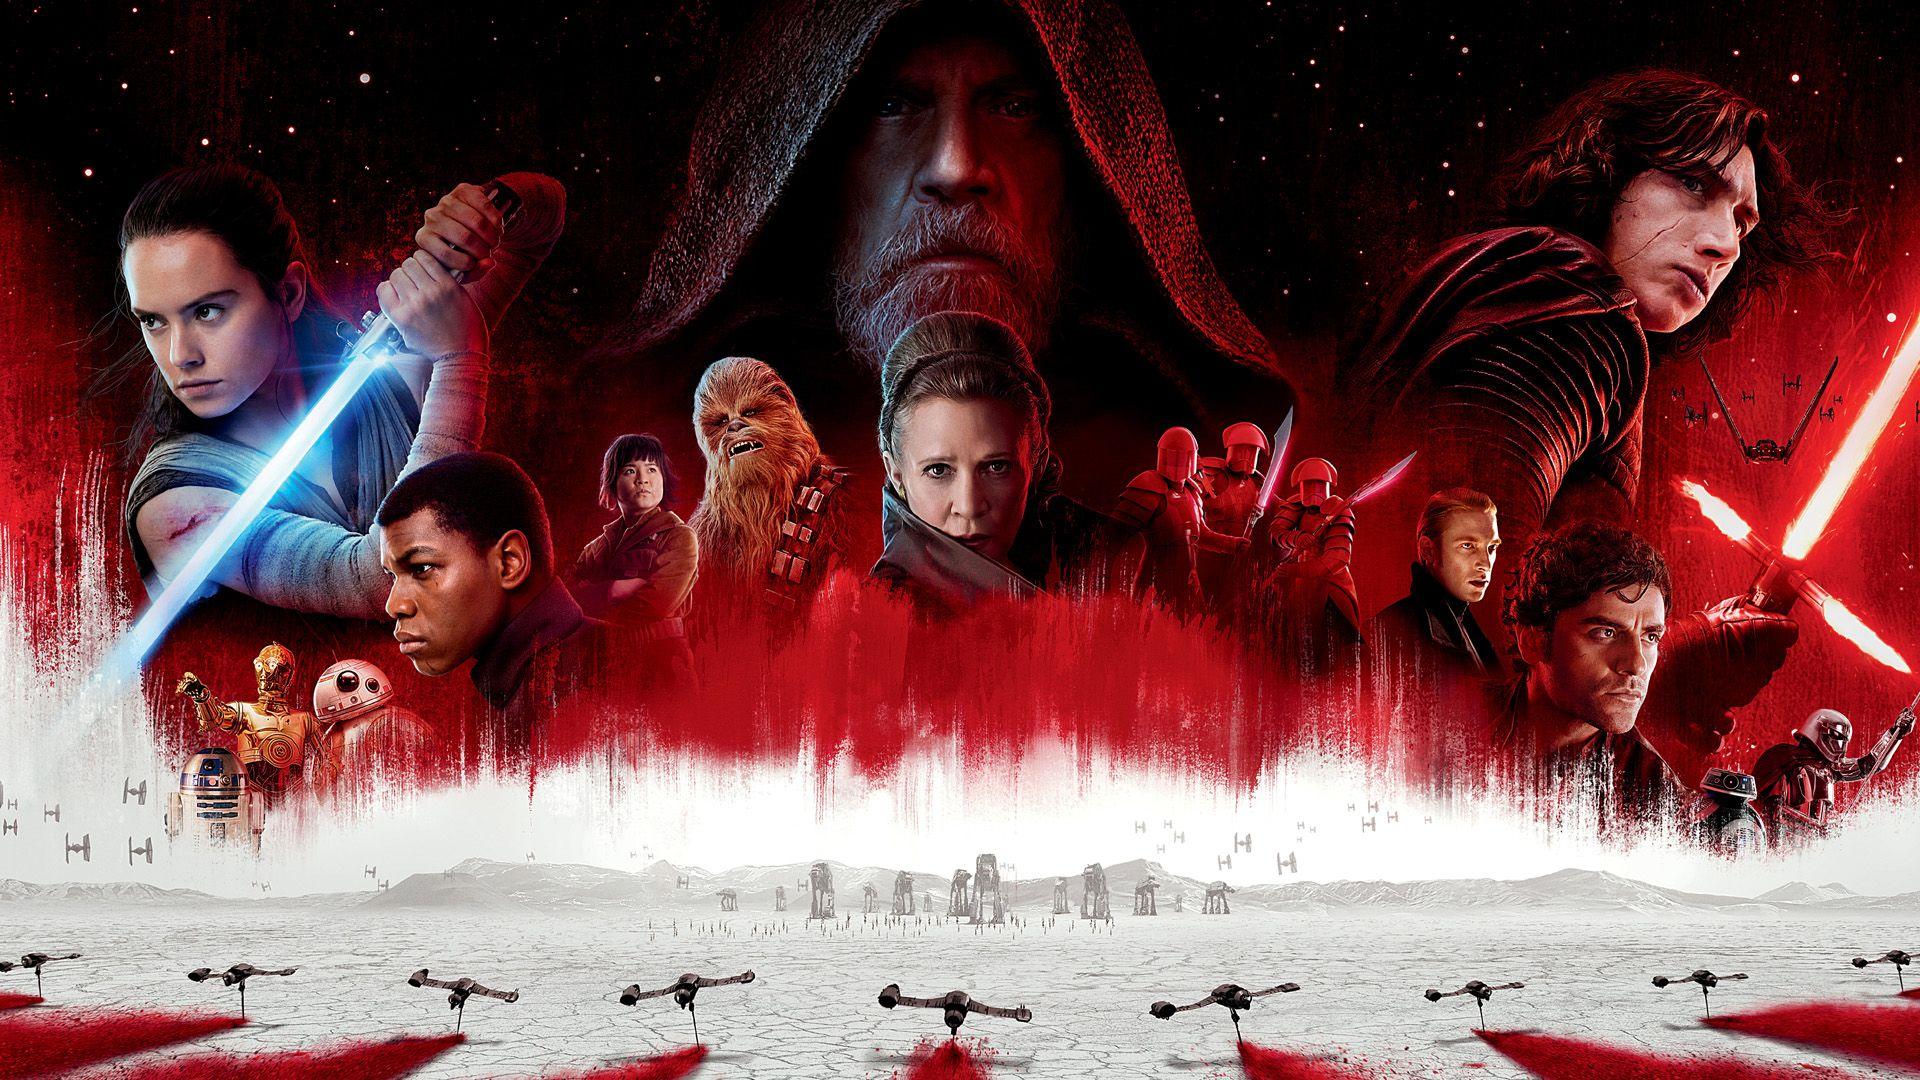 Star Wars Episode Viii The Last Jedi Star Wars Wallpaper Star Wars Film Star Wars Episodes